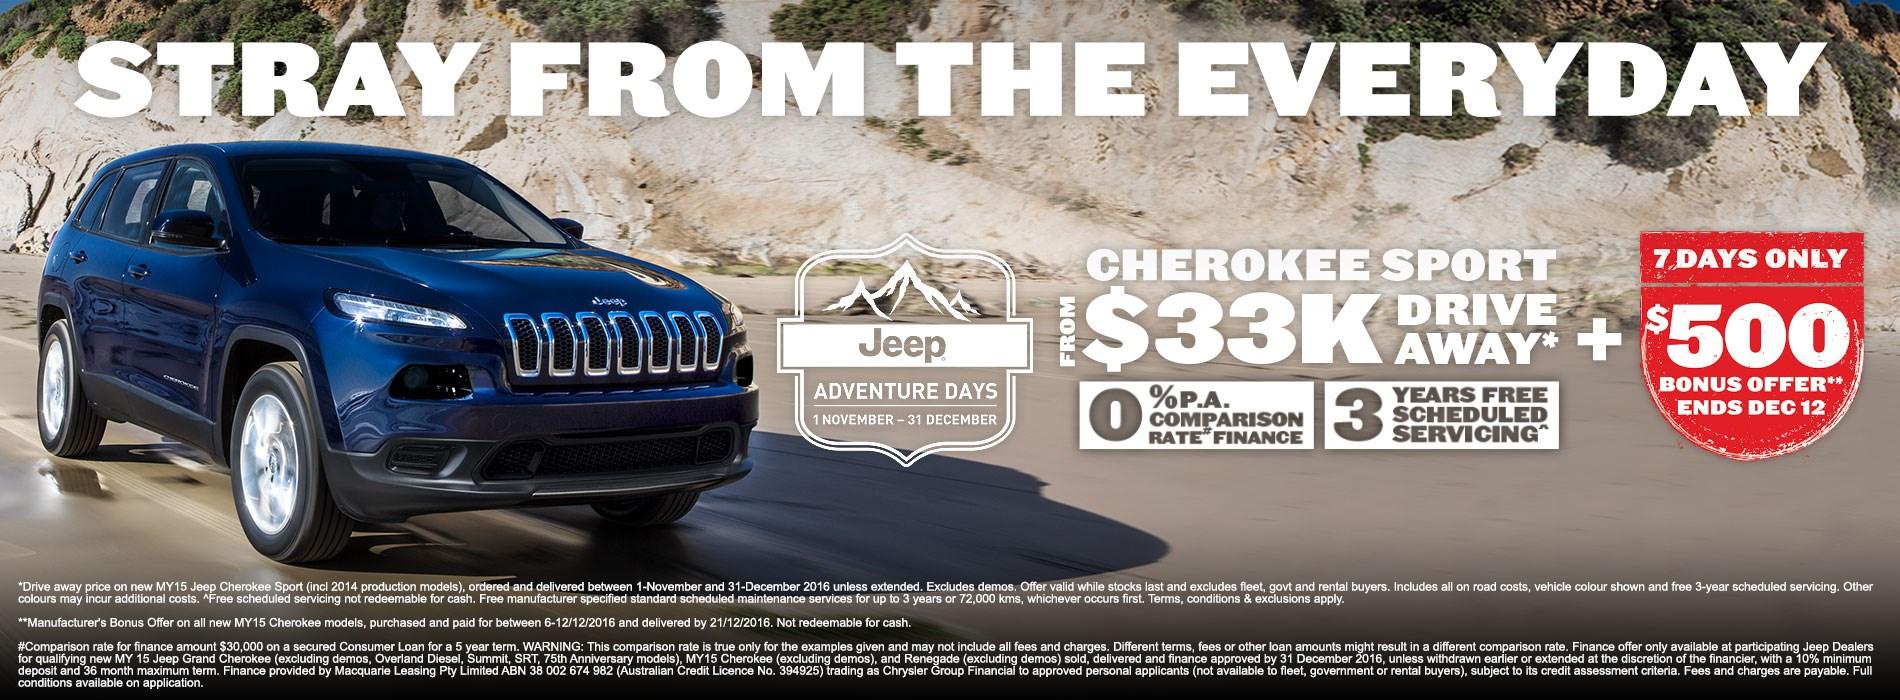 Jeep Cherokee Sport Offer